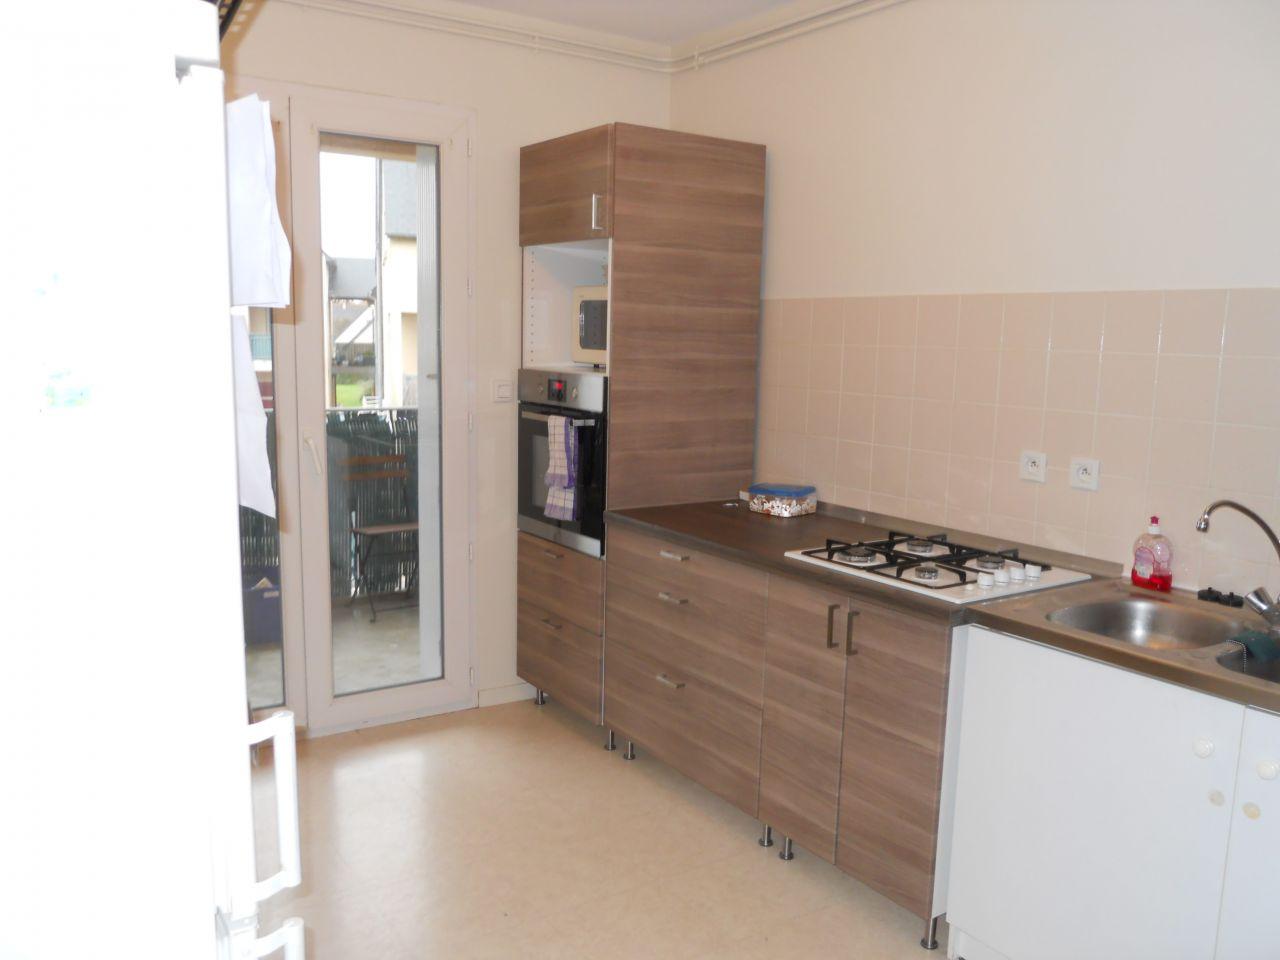 les projets implantation de vos cuisines 8859 messages page 537. Black Bedroom Furniture Sets. Home Design Ideas